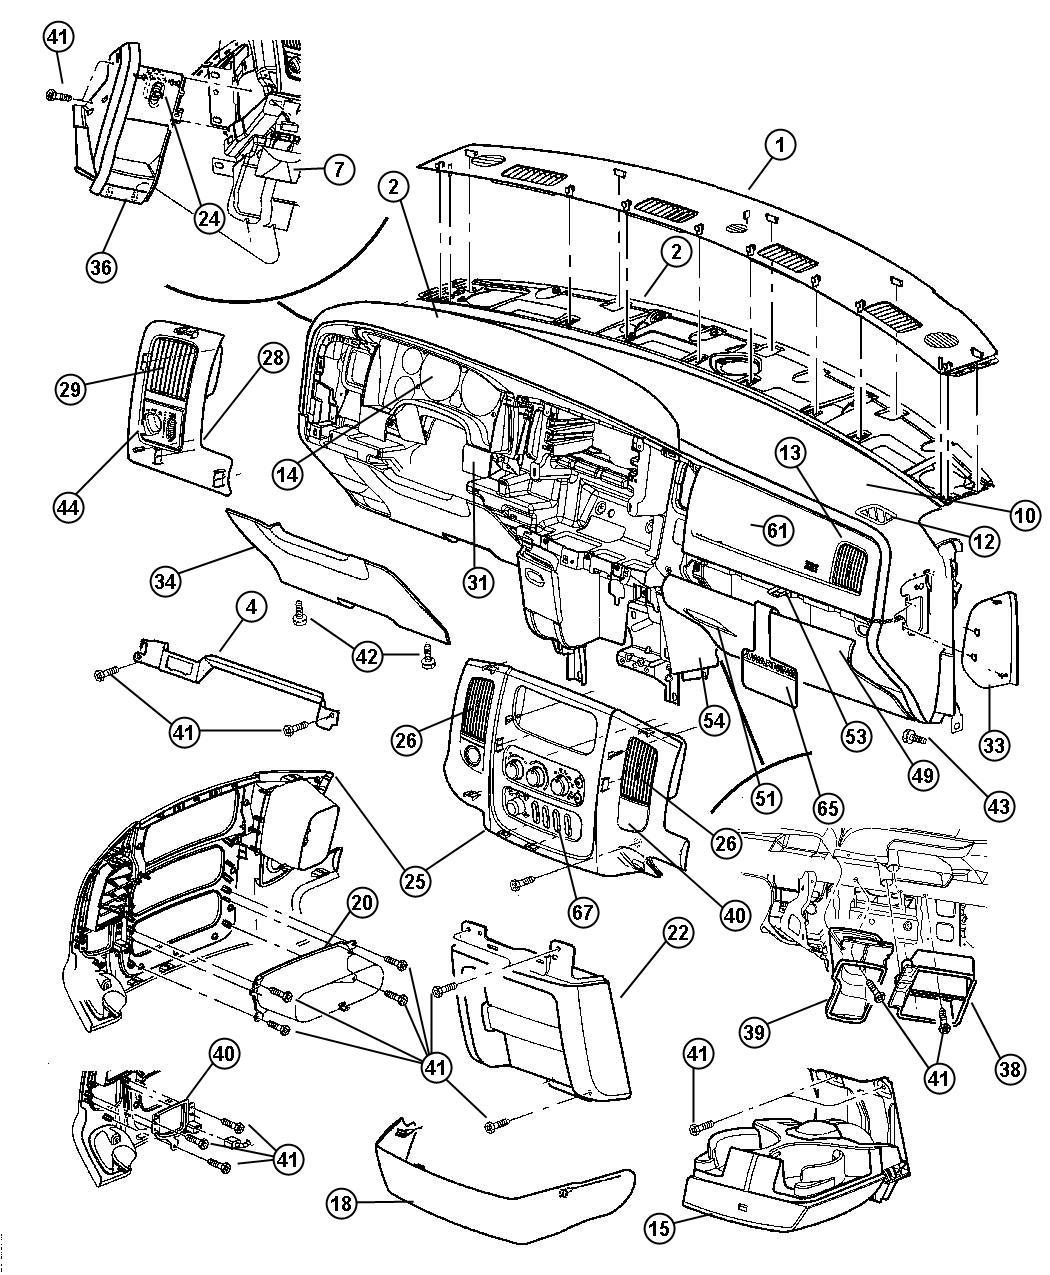 Dodge Ram 3500 Nut. Plastic snap-in. I/panel to retainer